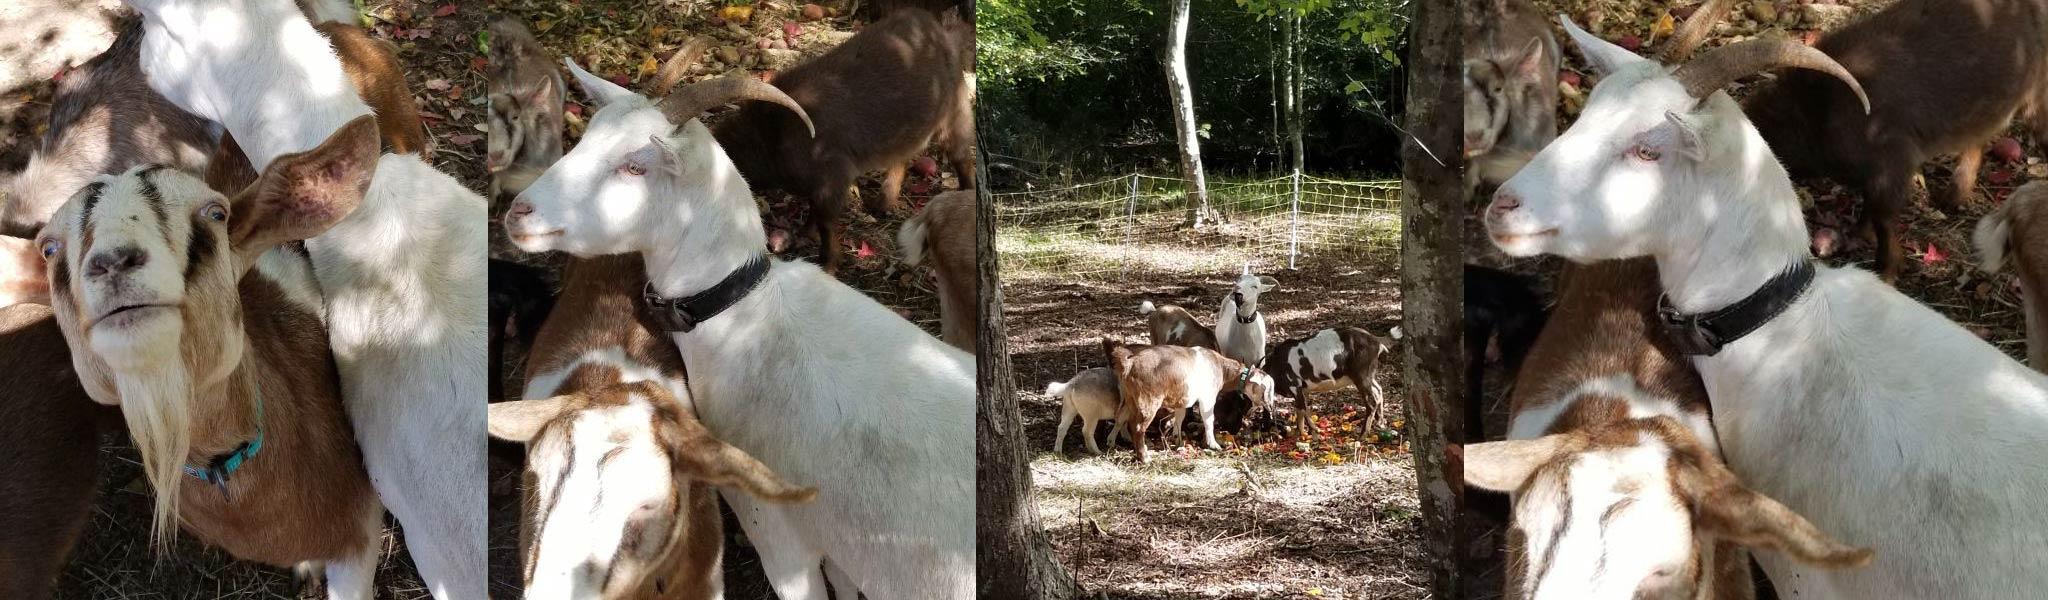 marthas vineyard goats